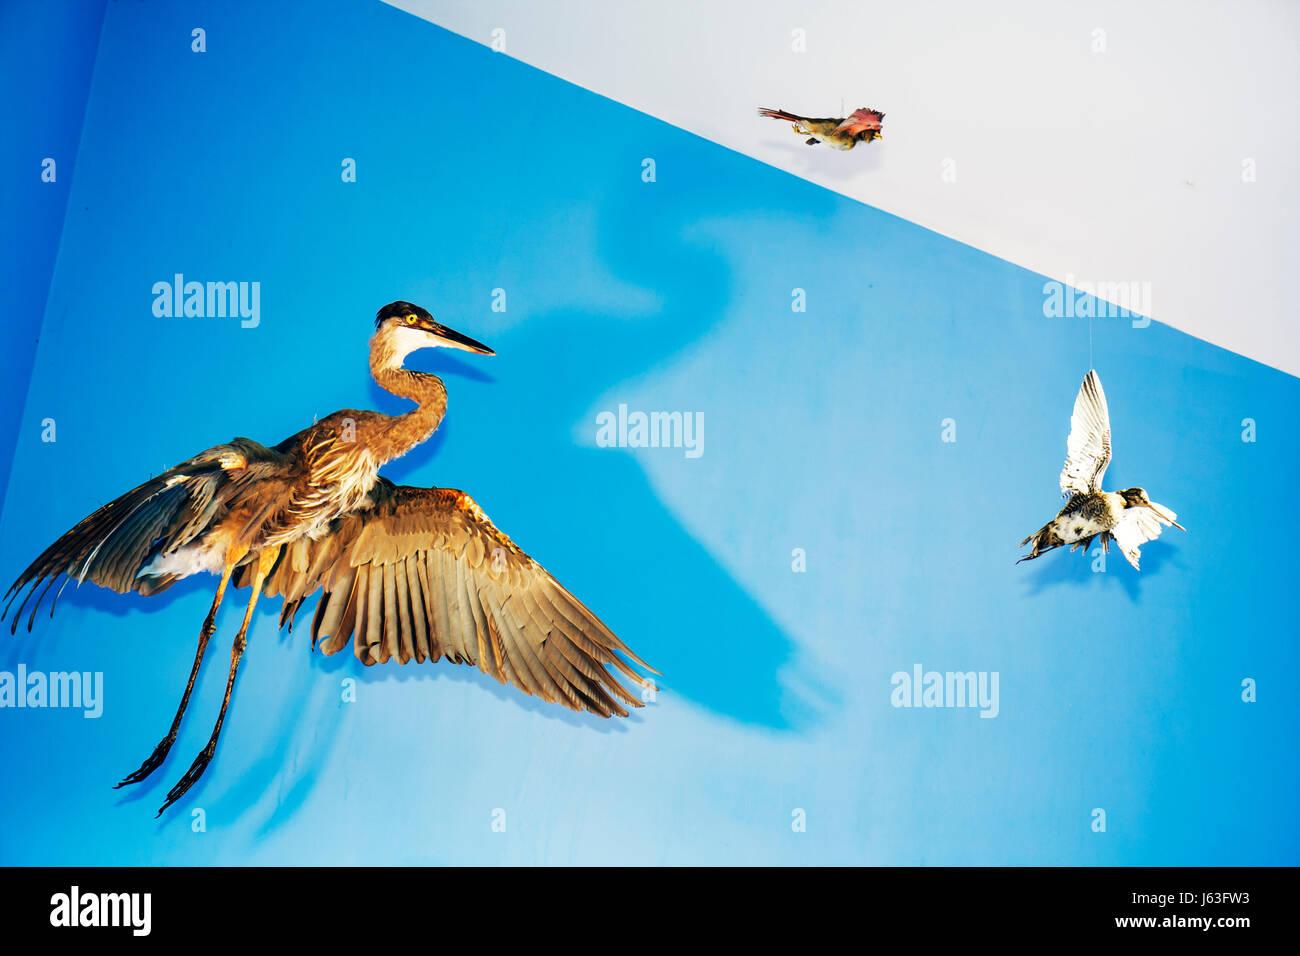 Indiana Chesterton Indiana Dunes State Park Nature Center bird species local fauna wildlife exhibit taxidermy - Stock Image